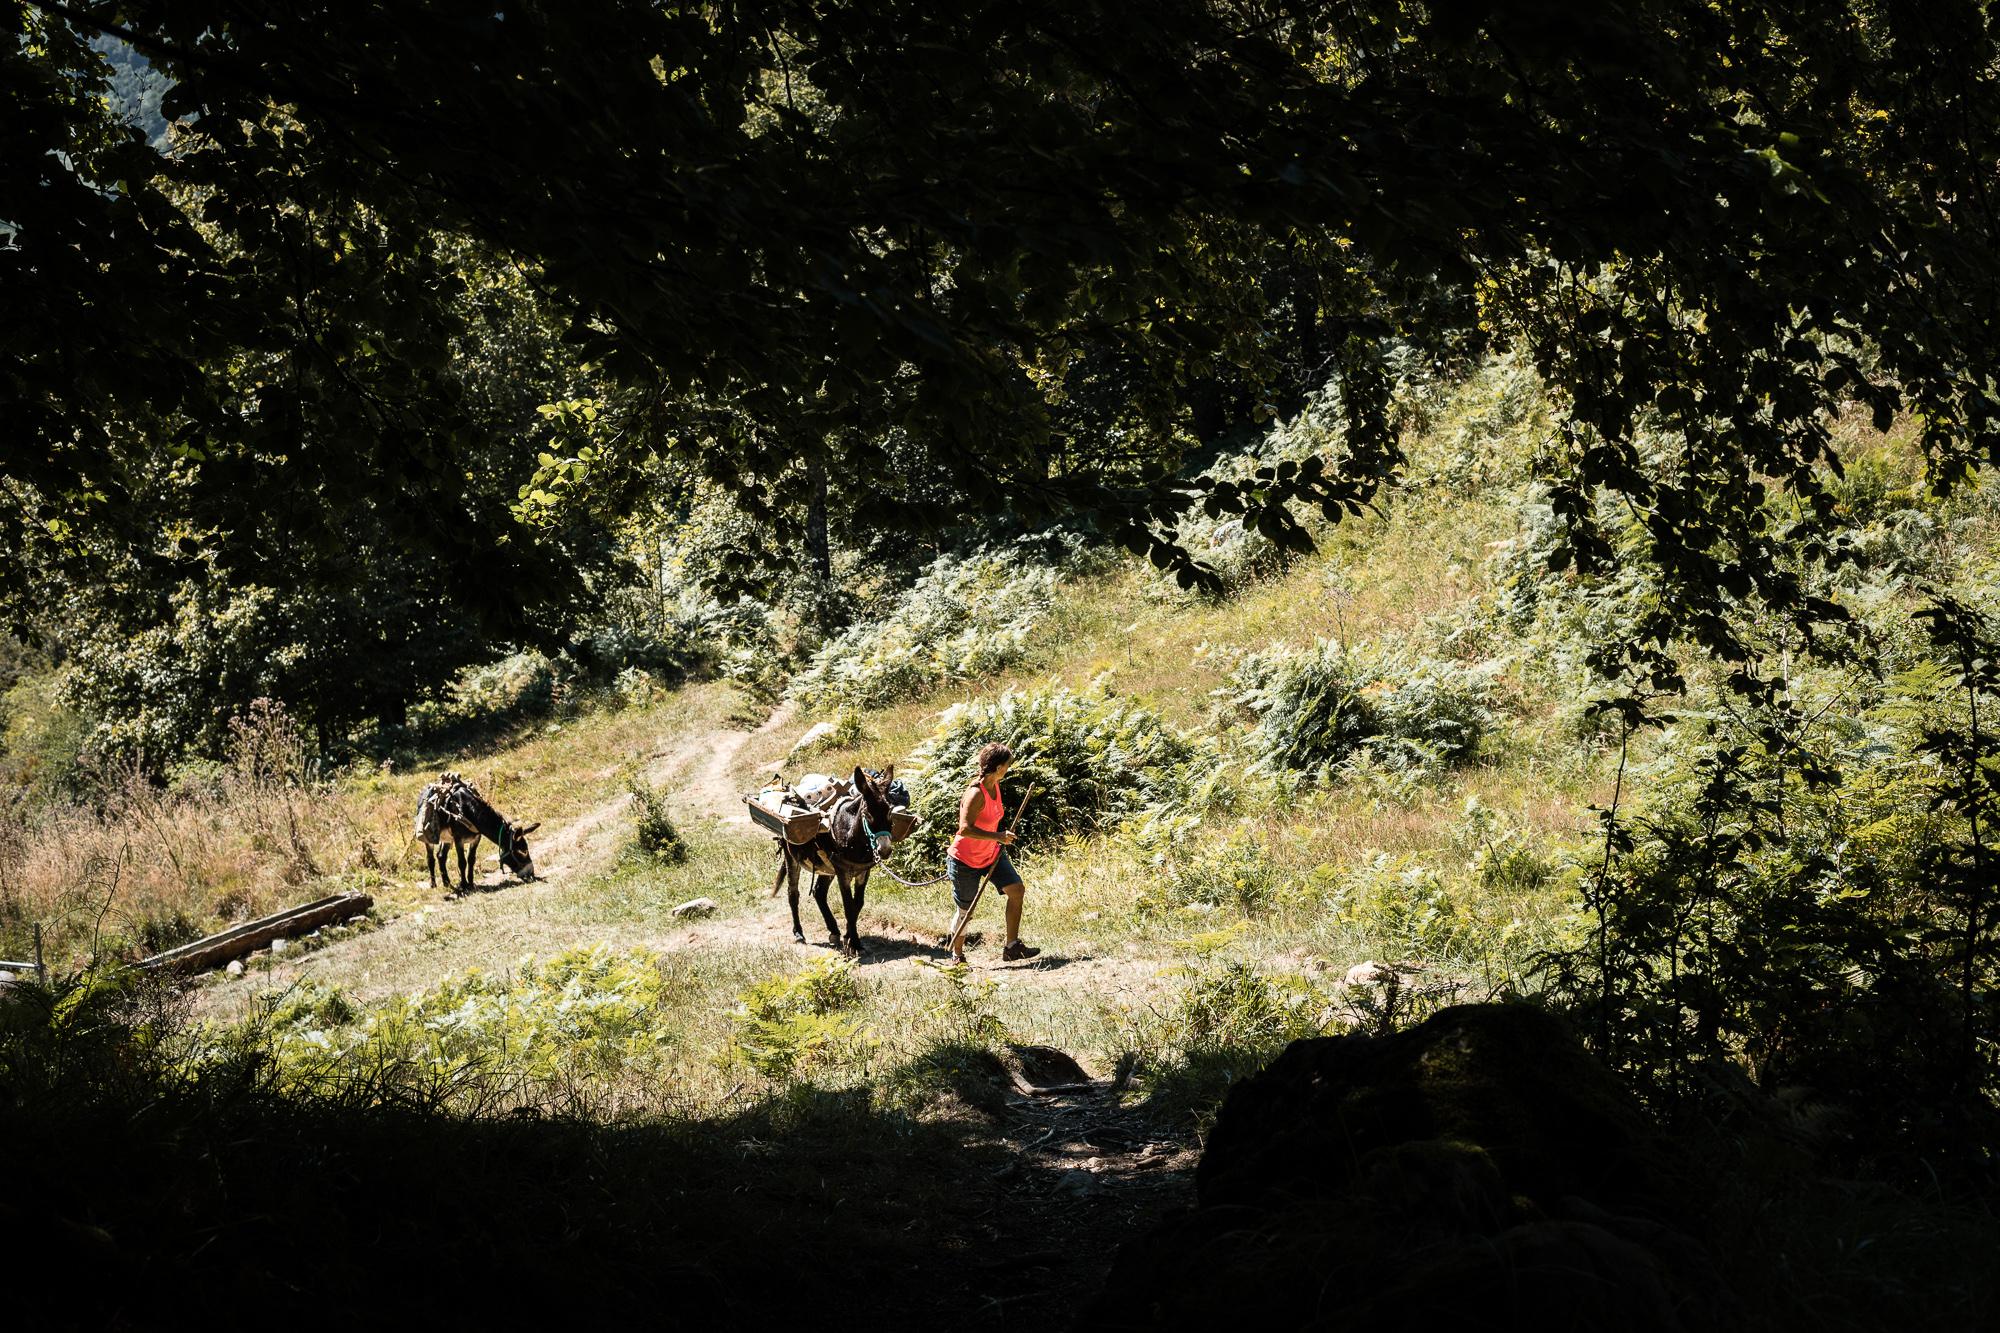 rando ânes chemin mature